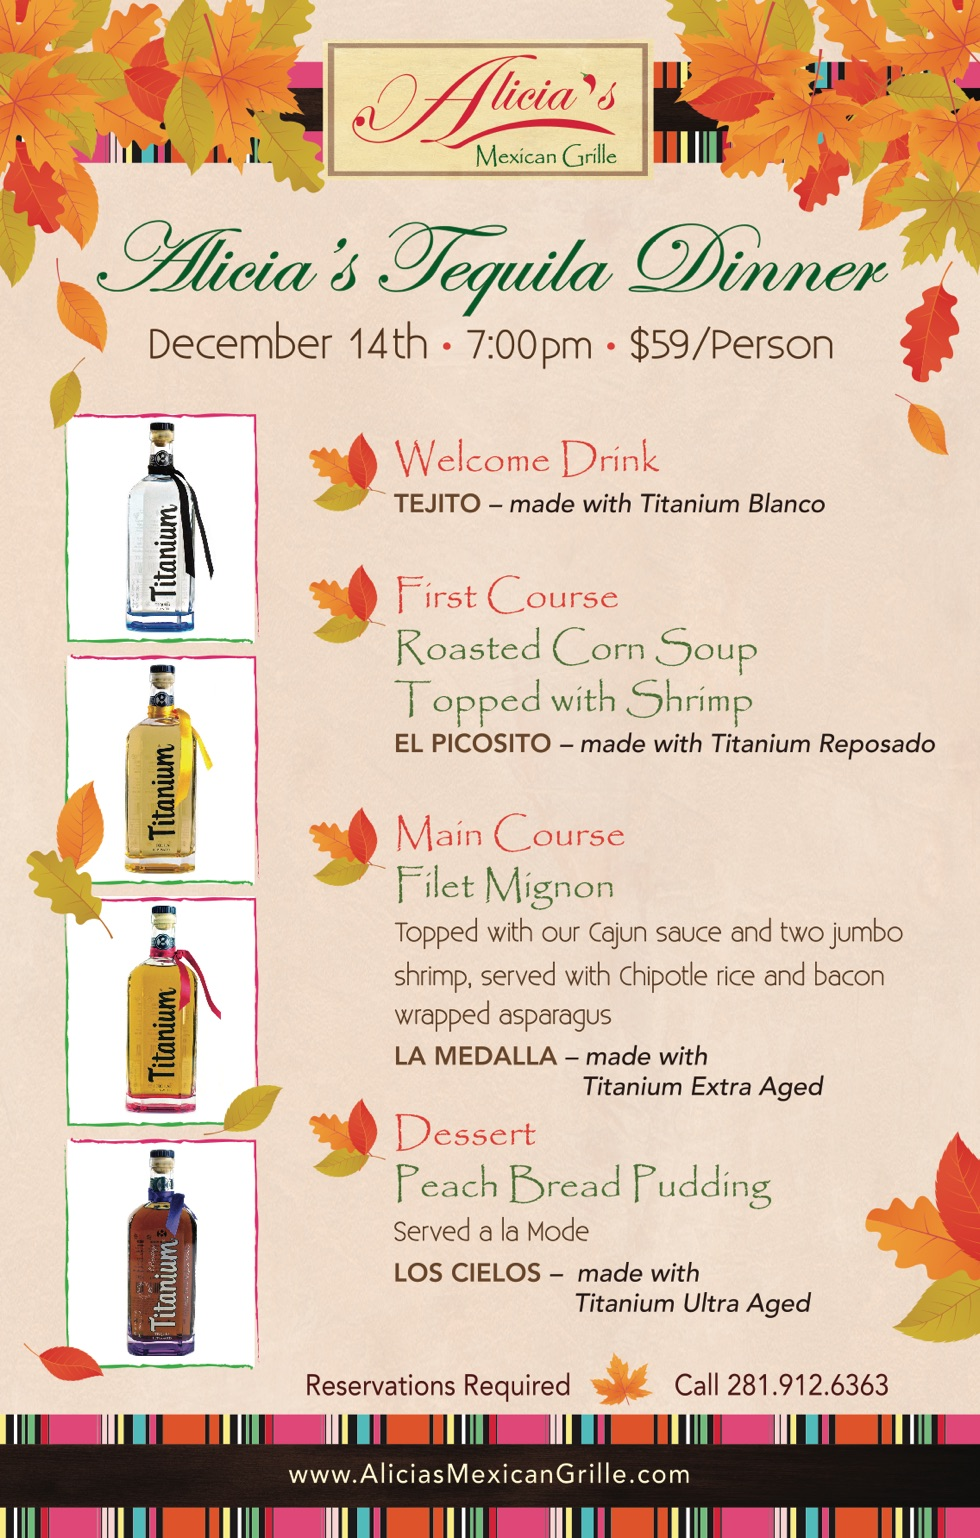 Alicia's Tequila Dinner at Sugar Land December 14th